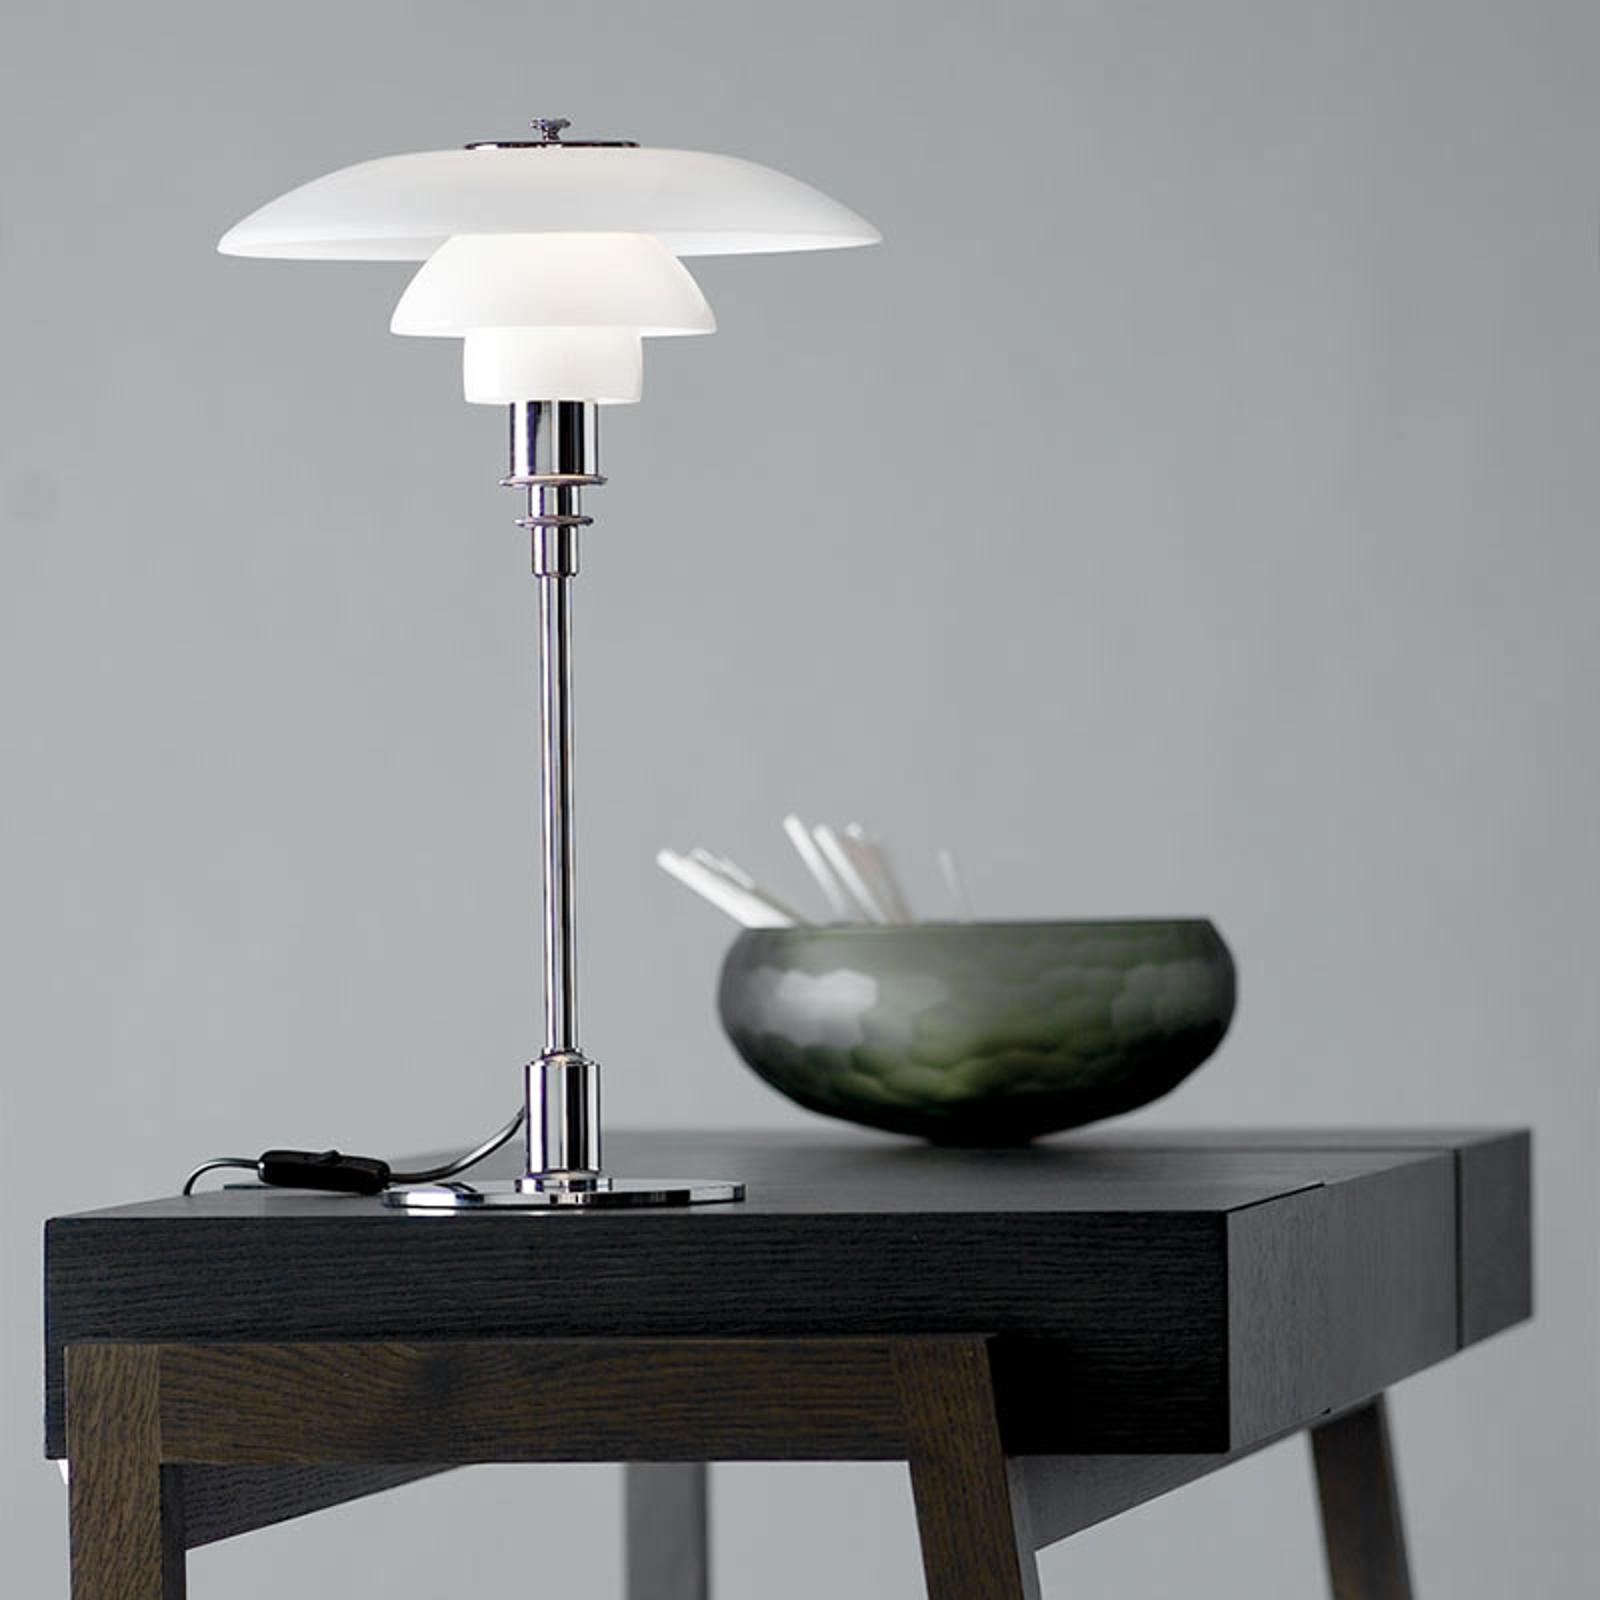 Louis Poulsen PH 3/2 tafellamp verchroomd